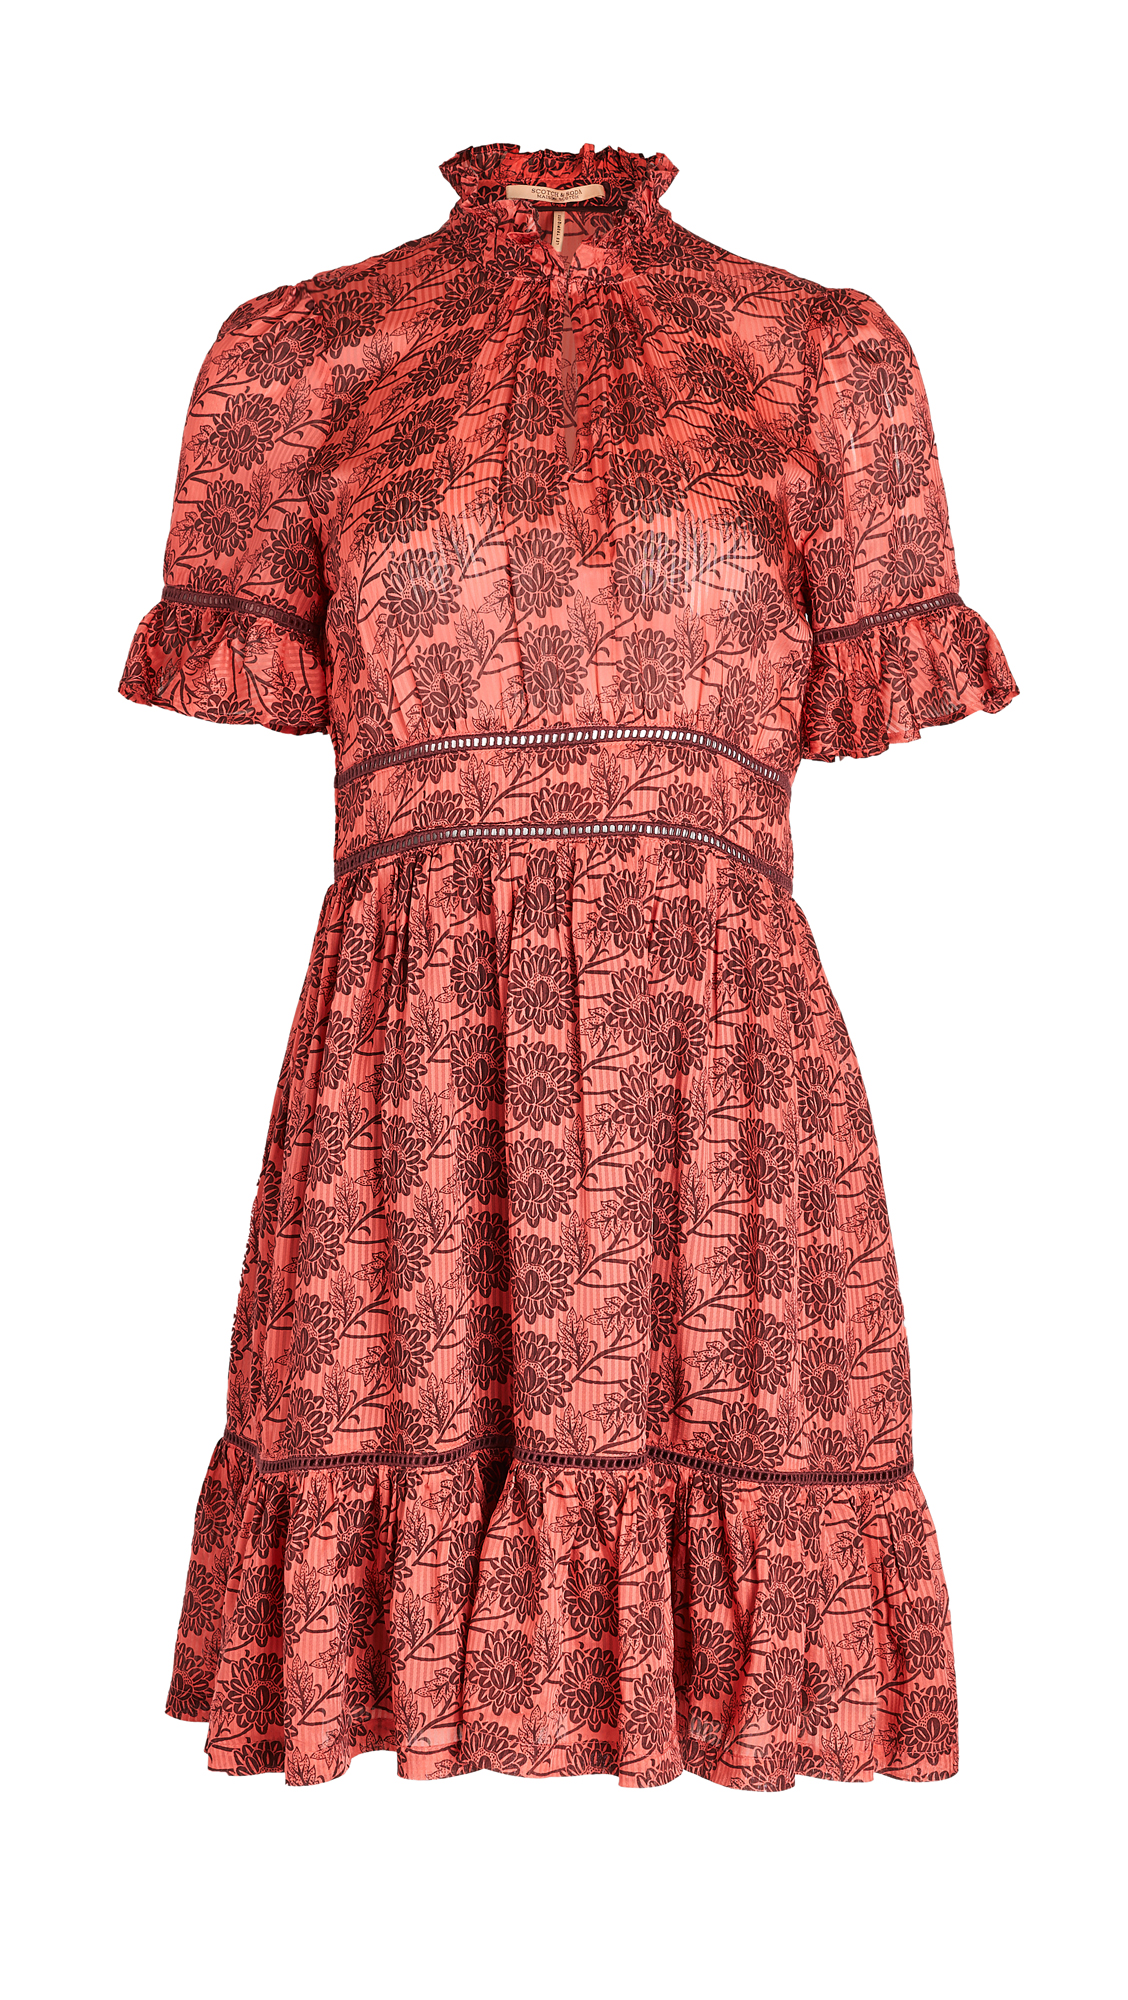 Scotch & Soda/Maison Scotch Printed Dress